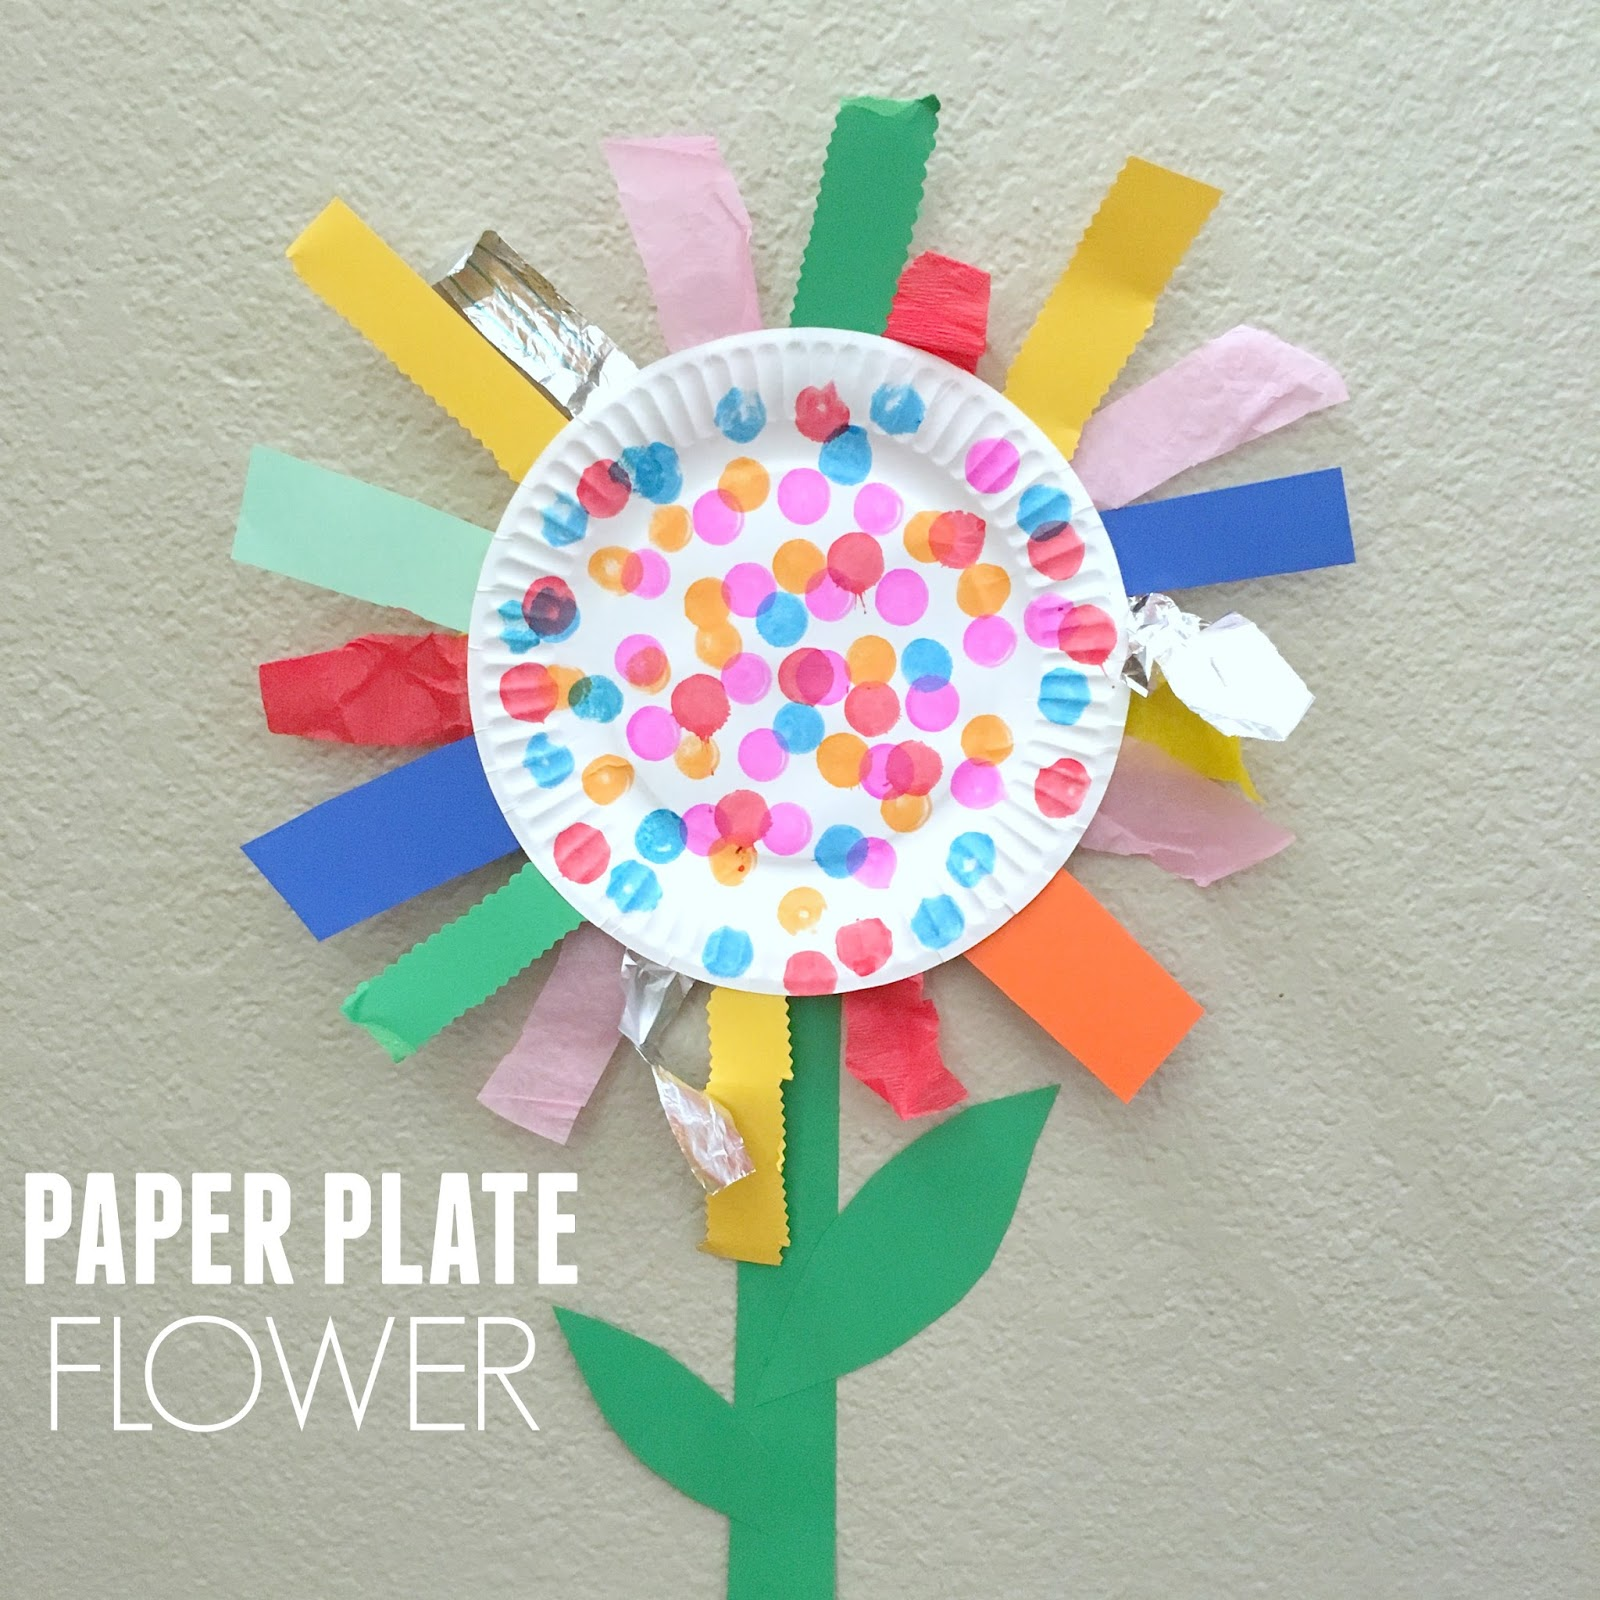 Toddler Approved!: Paper Plate Flower Fine Motor Craft